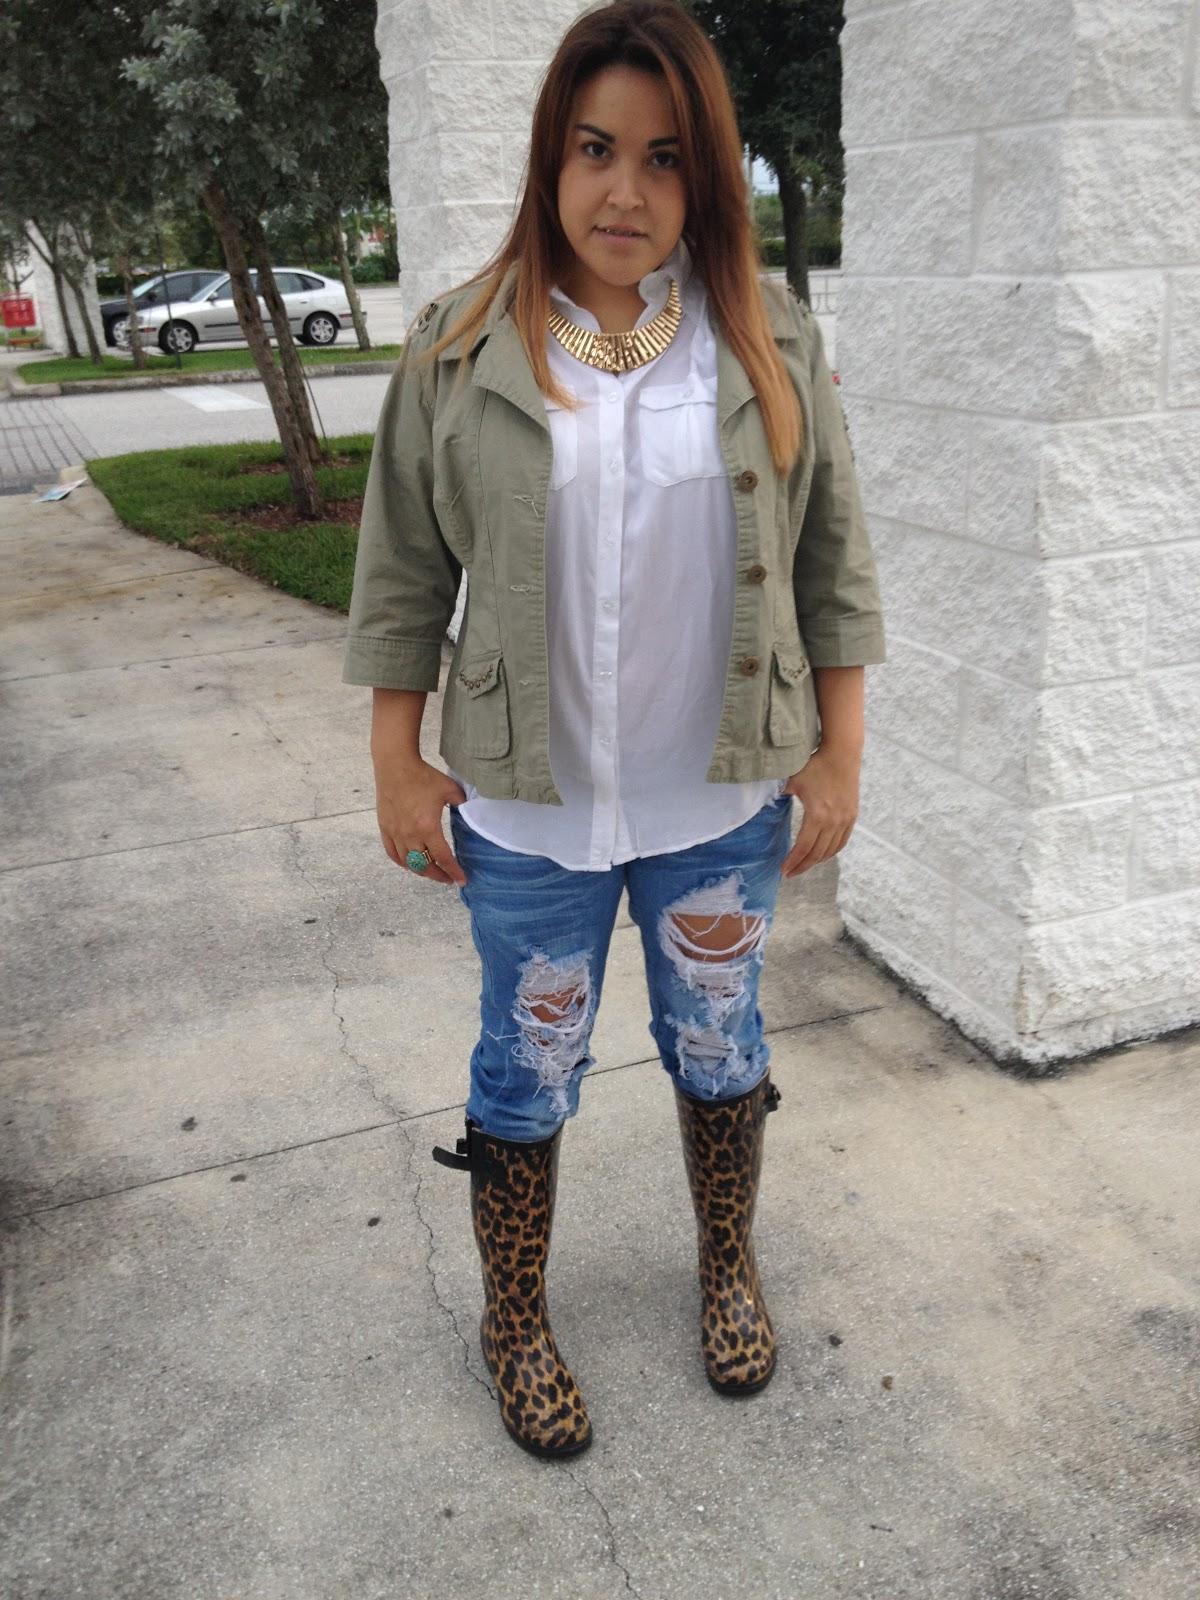 Flawless Fashionista Styles: Leopard Rain Boots